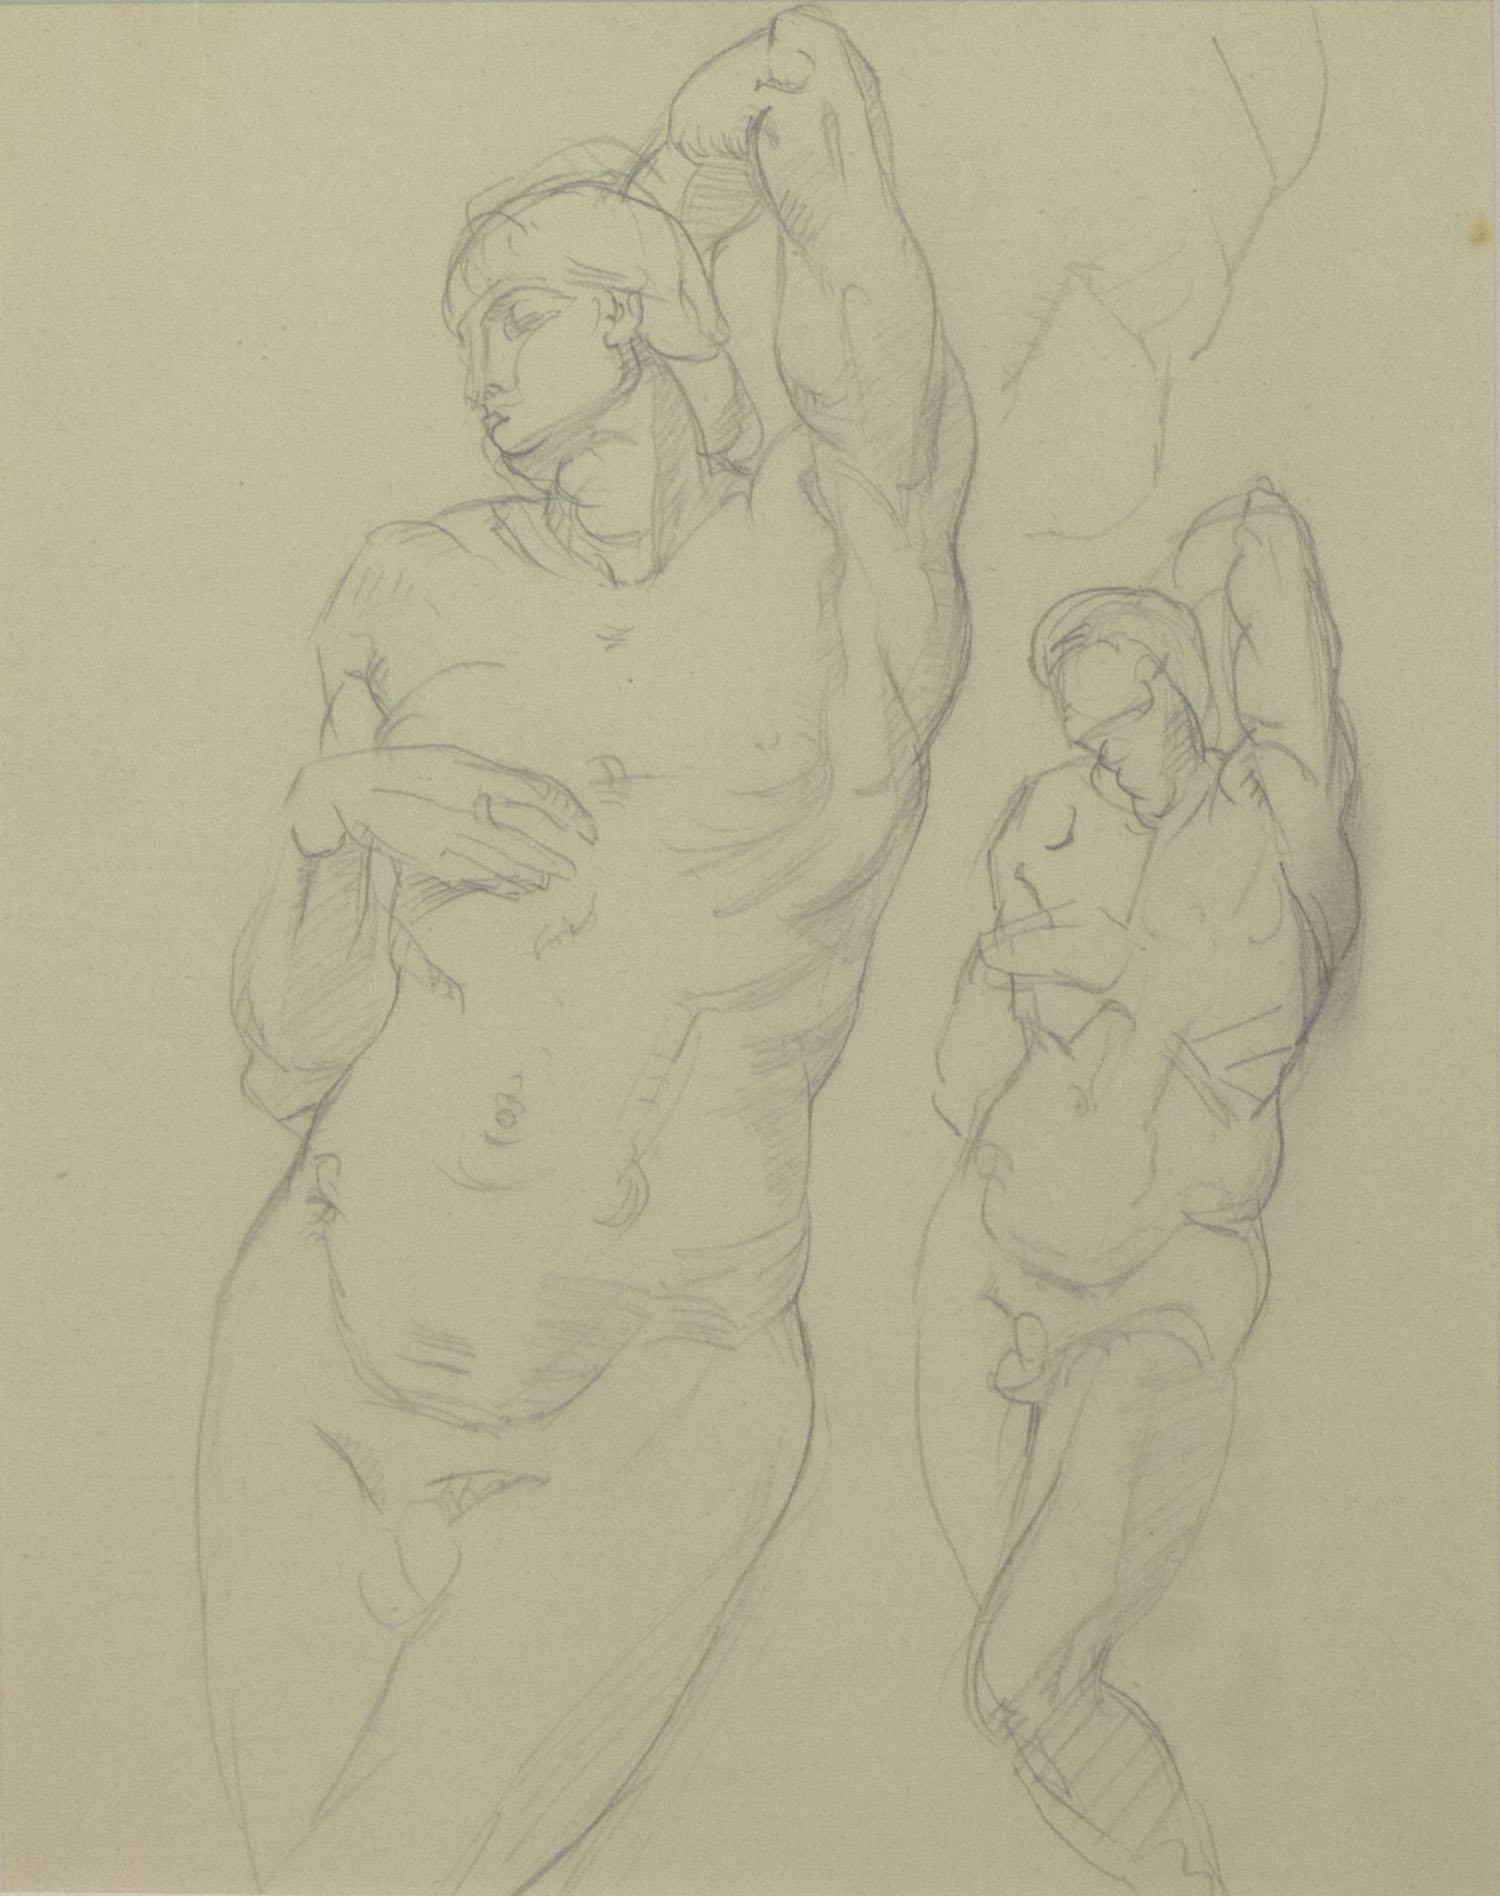 Mary Swanzy 'Life Study' pencil drawing 25x20cm.jpg